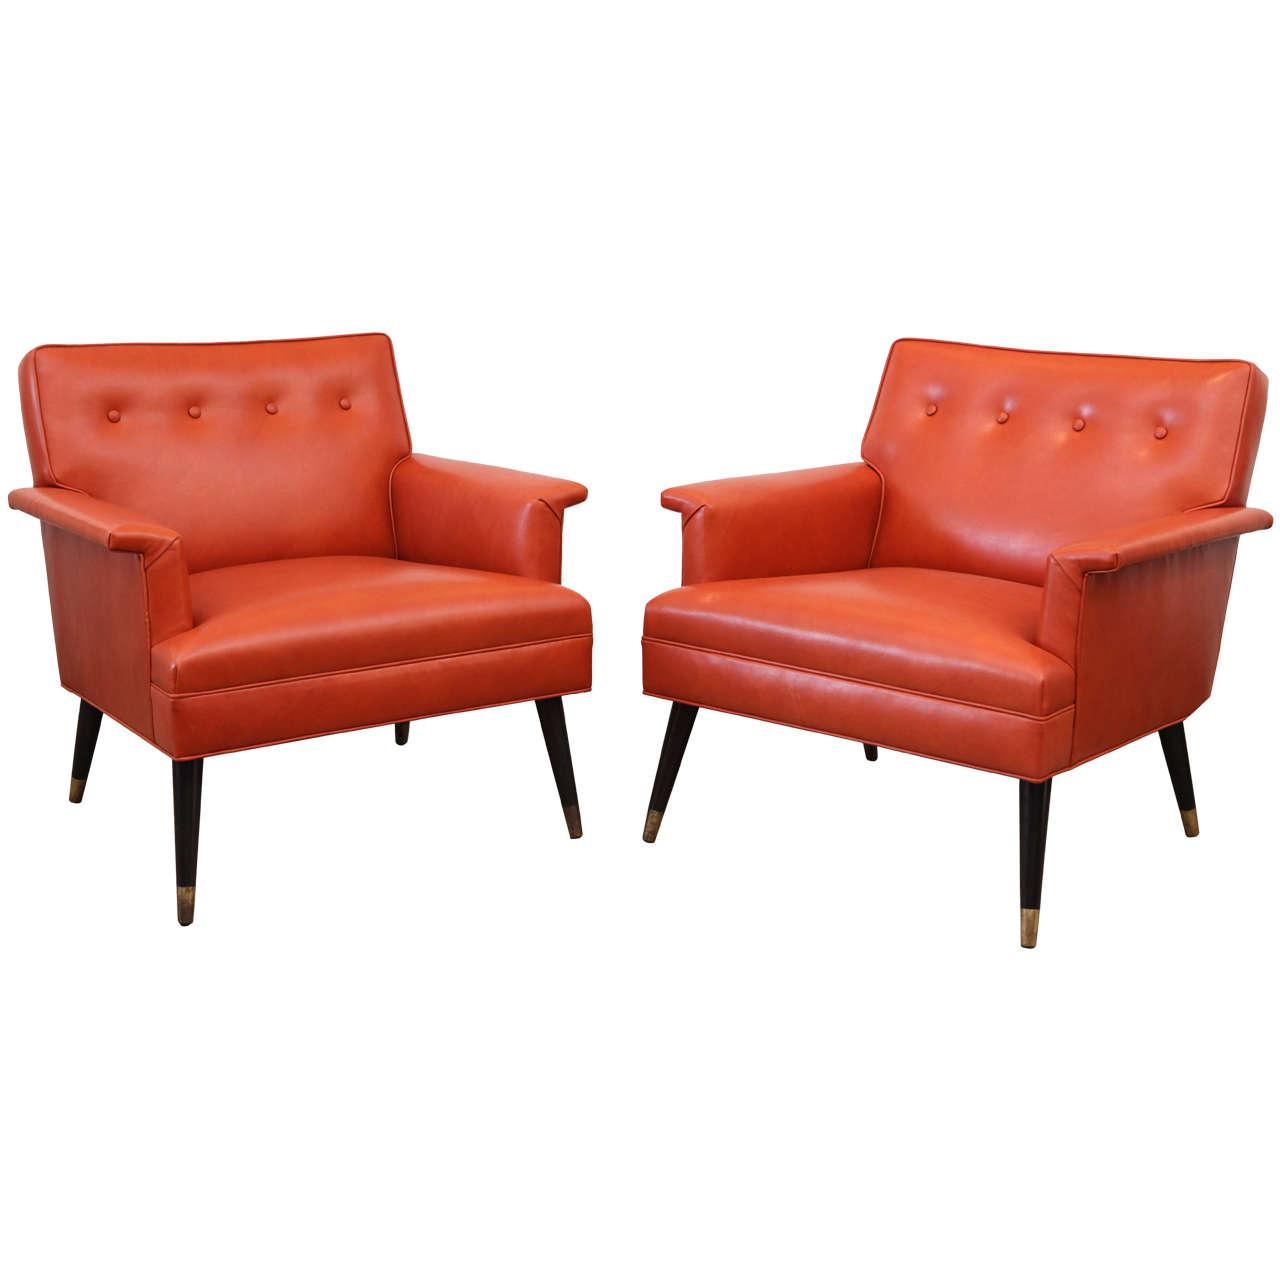 pair of orange leather mid century armchairs at 1stdibs